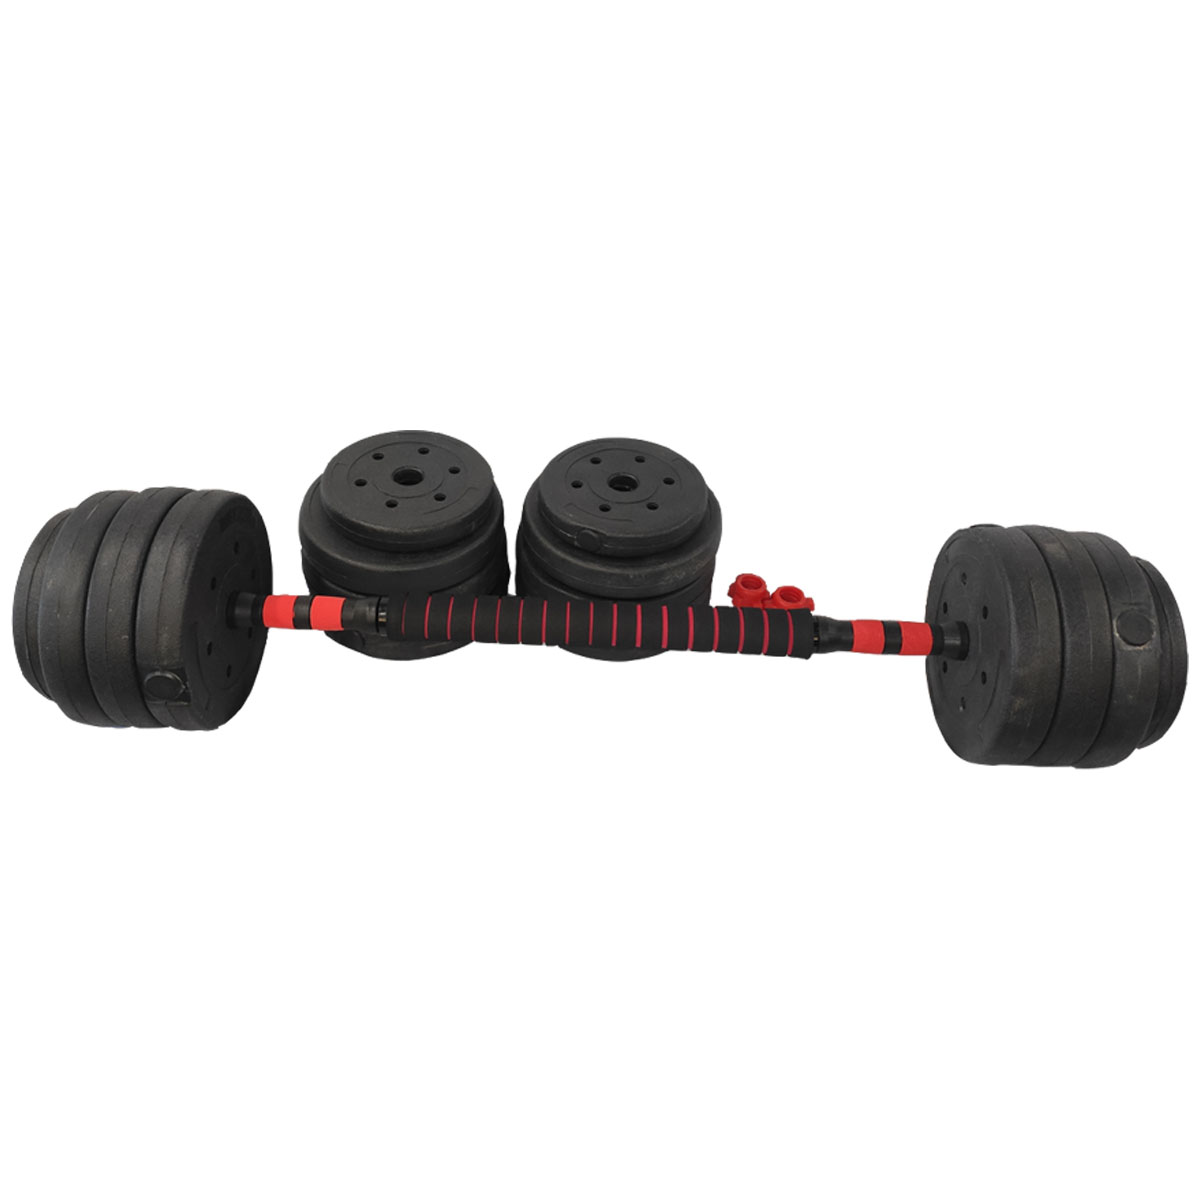 Barra Anilha Halter Dumbbell Kit Musculaçao 40kg